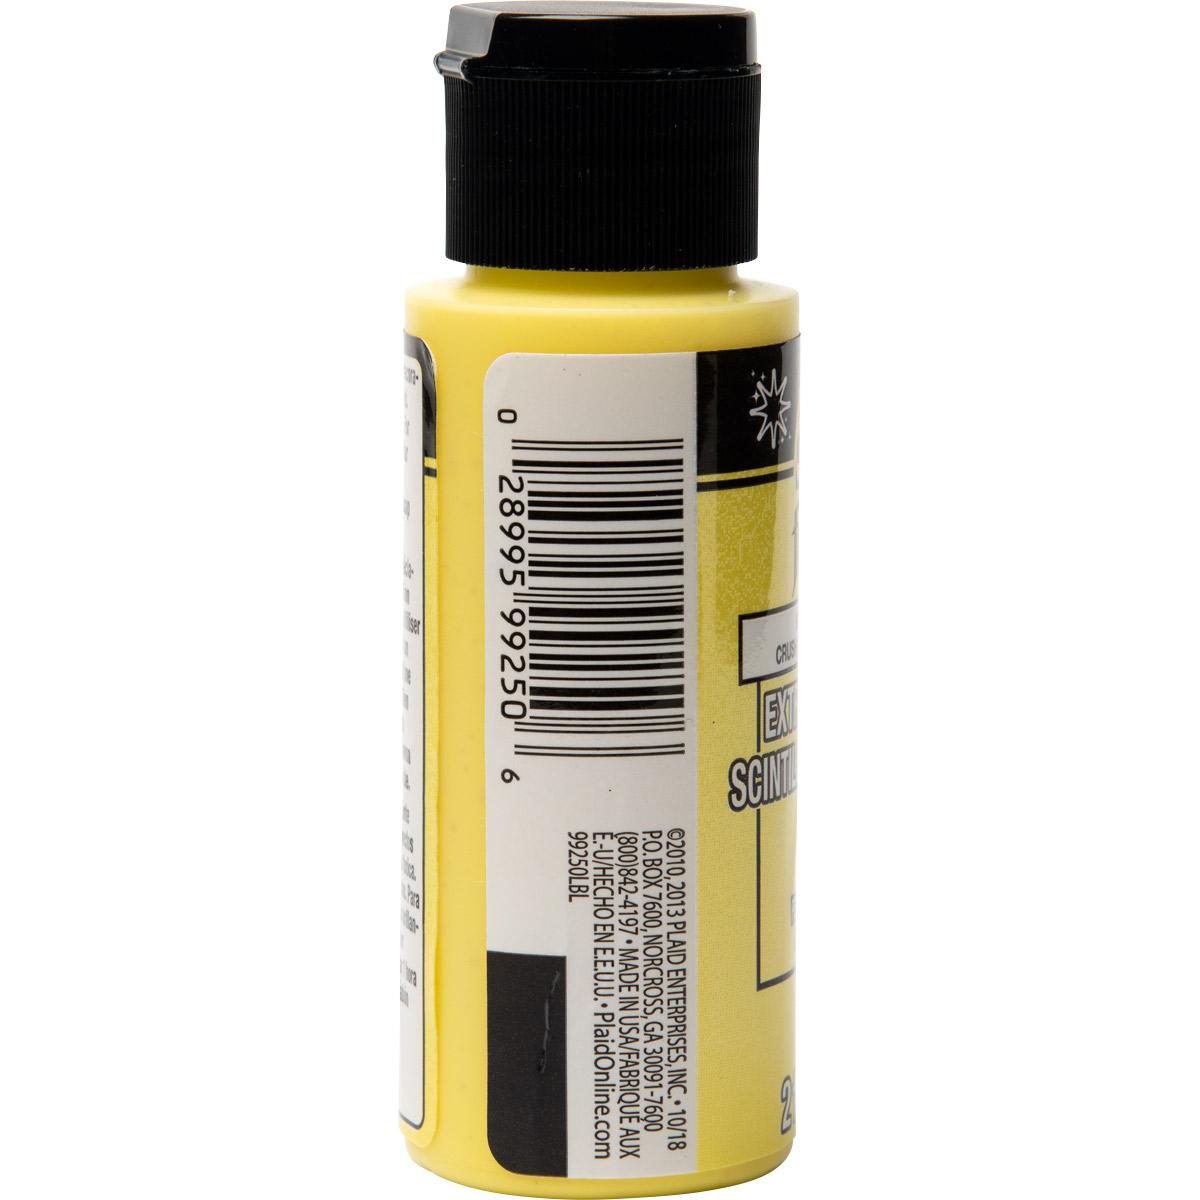 FolkArt ® Extreme Glitter™ - Lemon Crush, 2 oz. - 99250